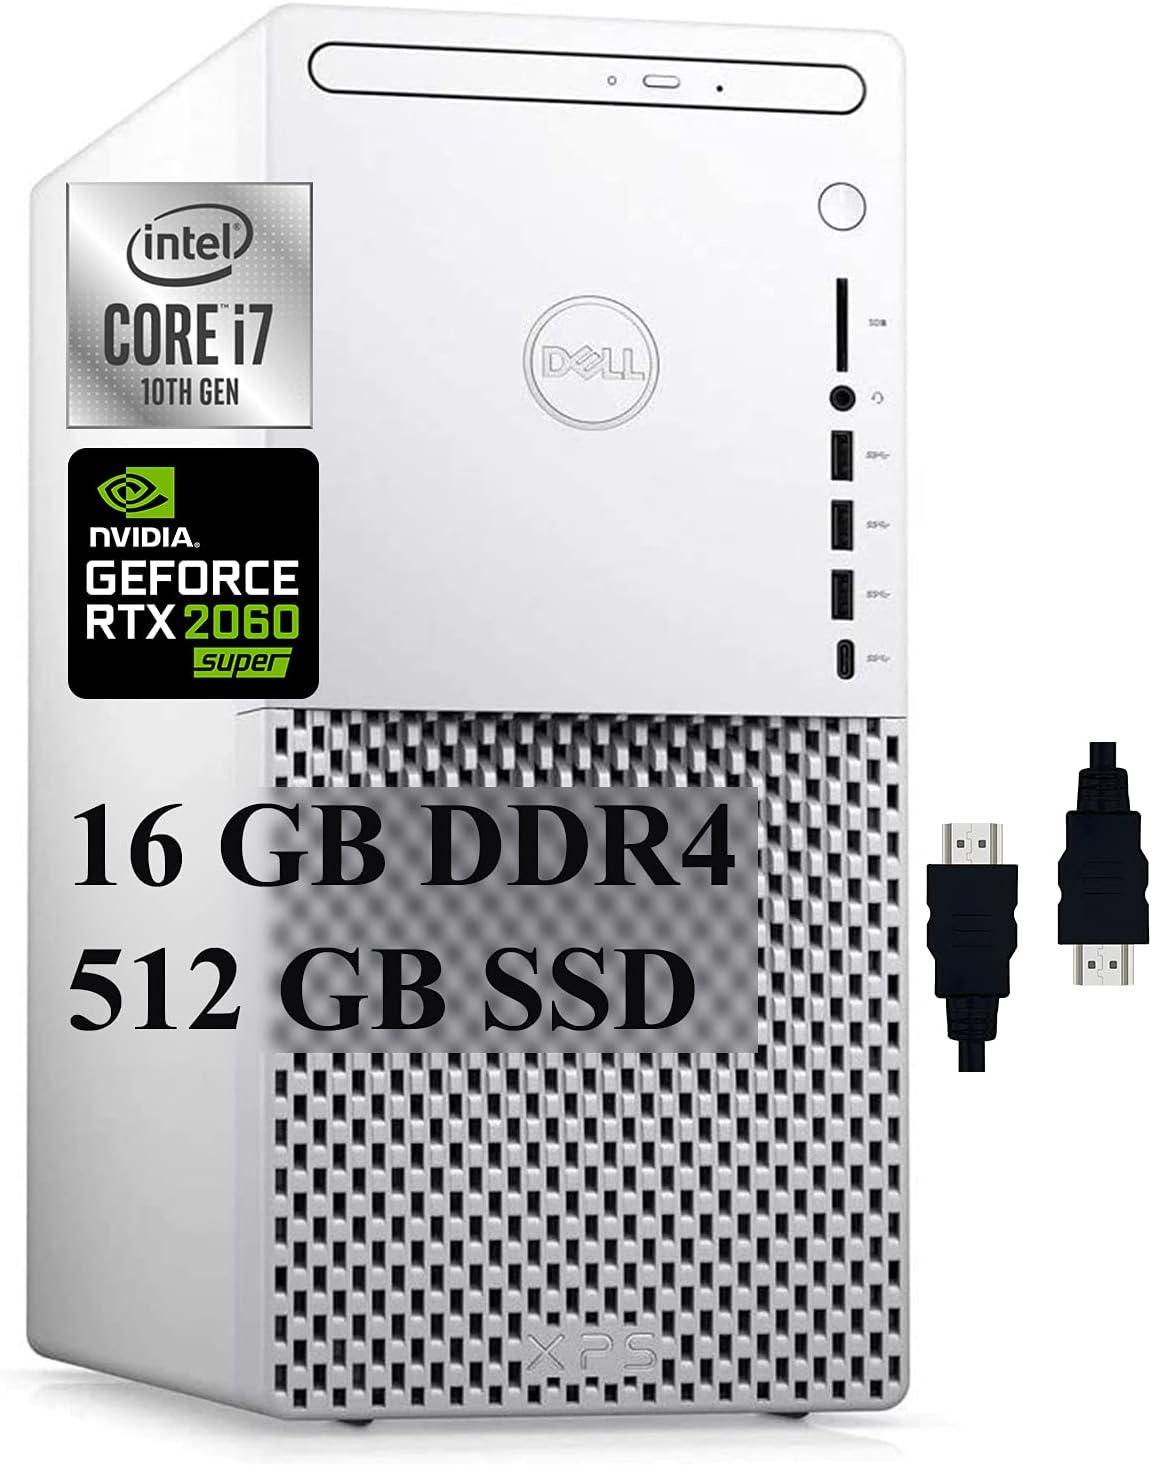 Dell XPS 8940 Special Edition 2021 Premium Gaming Tower Desktop I 10th Gen Intel 8-Core i7-10700 I 16GB DDR4 512GB SSD I Geforce RTX 2060 Super 8GB I DVD-RW USB-C WiFi Win10 + Delca HDMI Cable